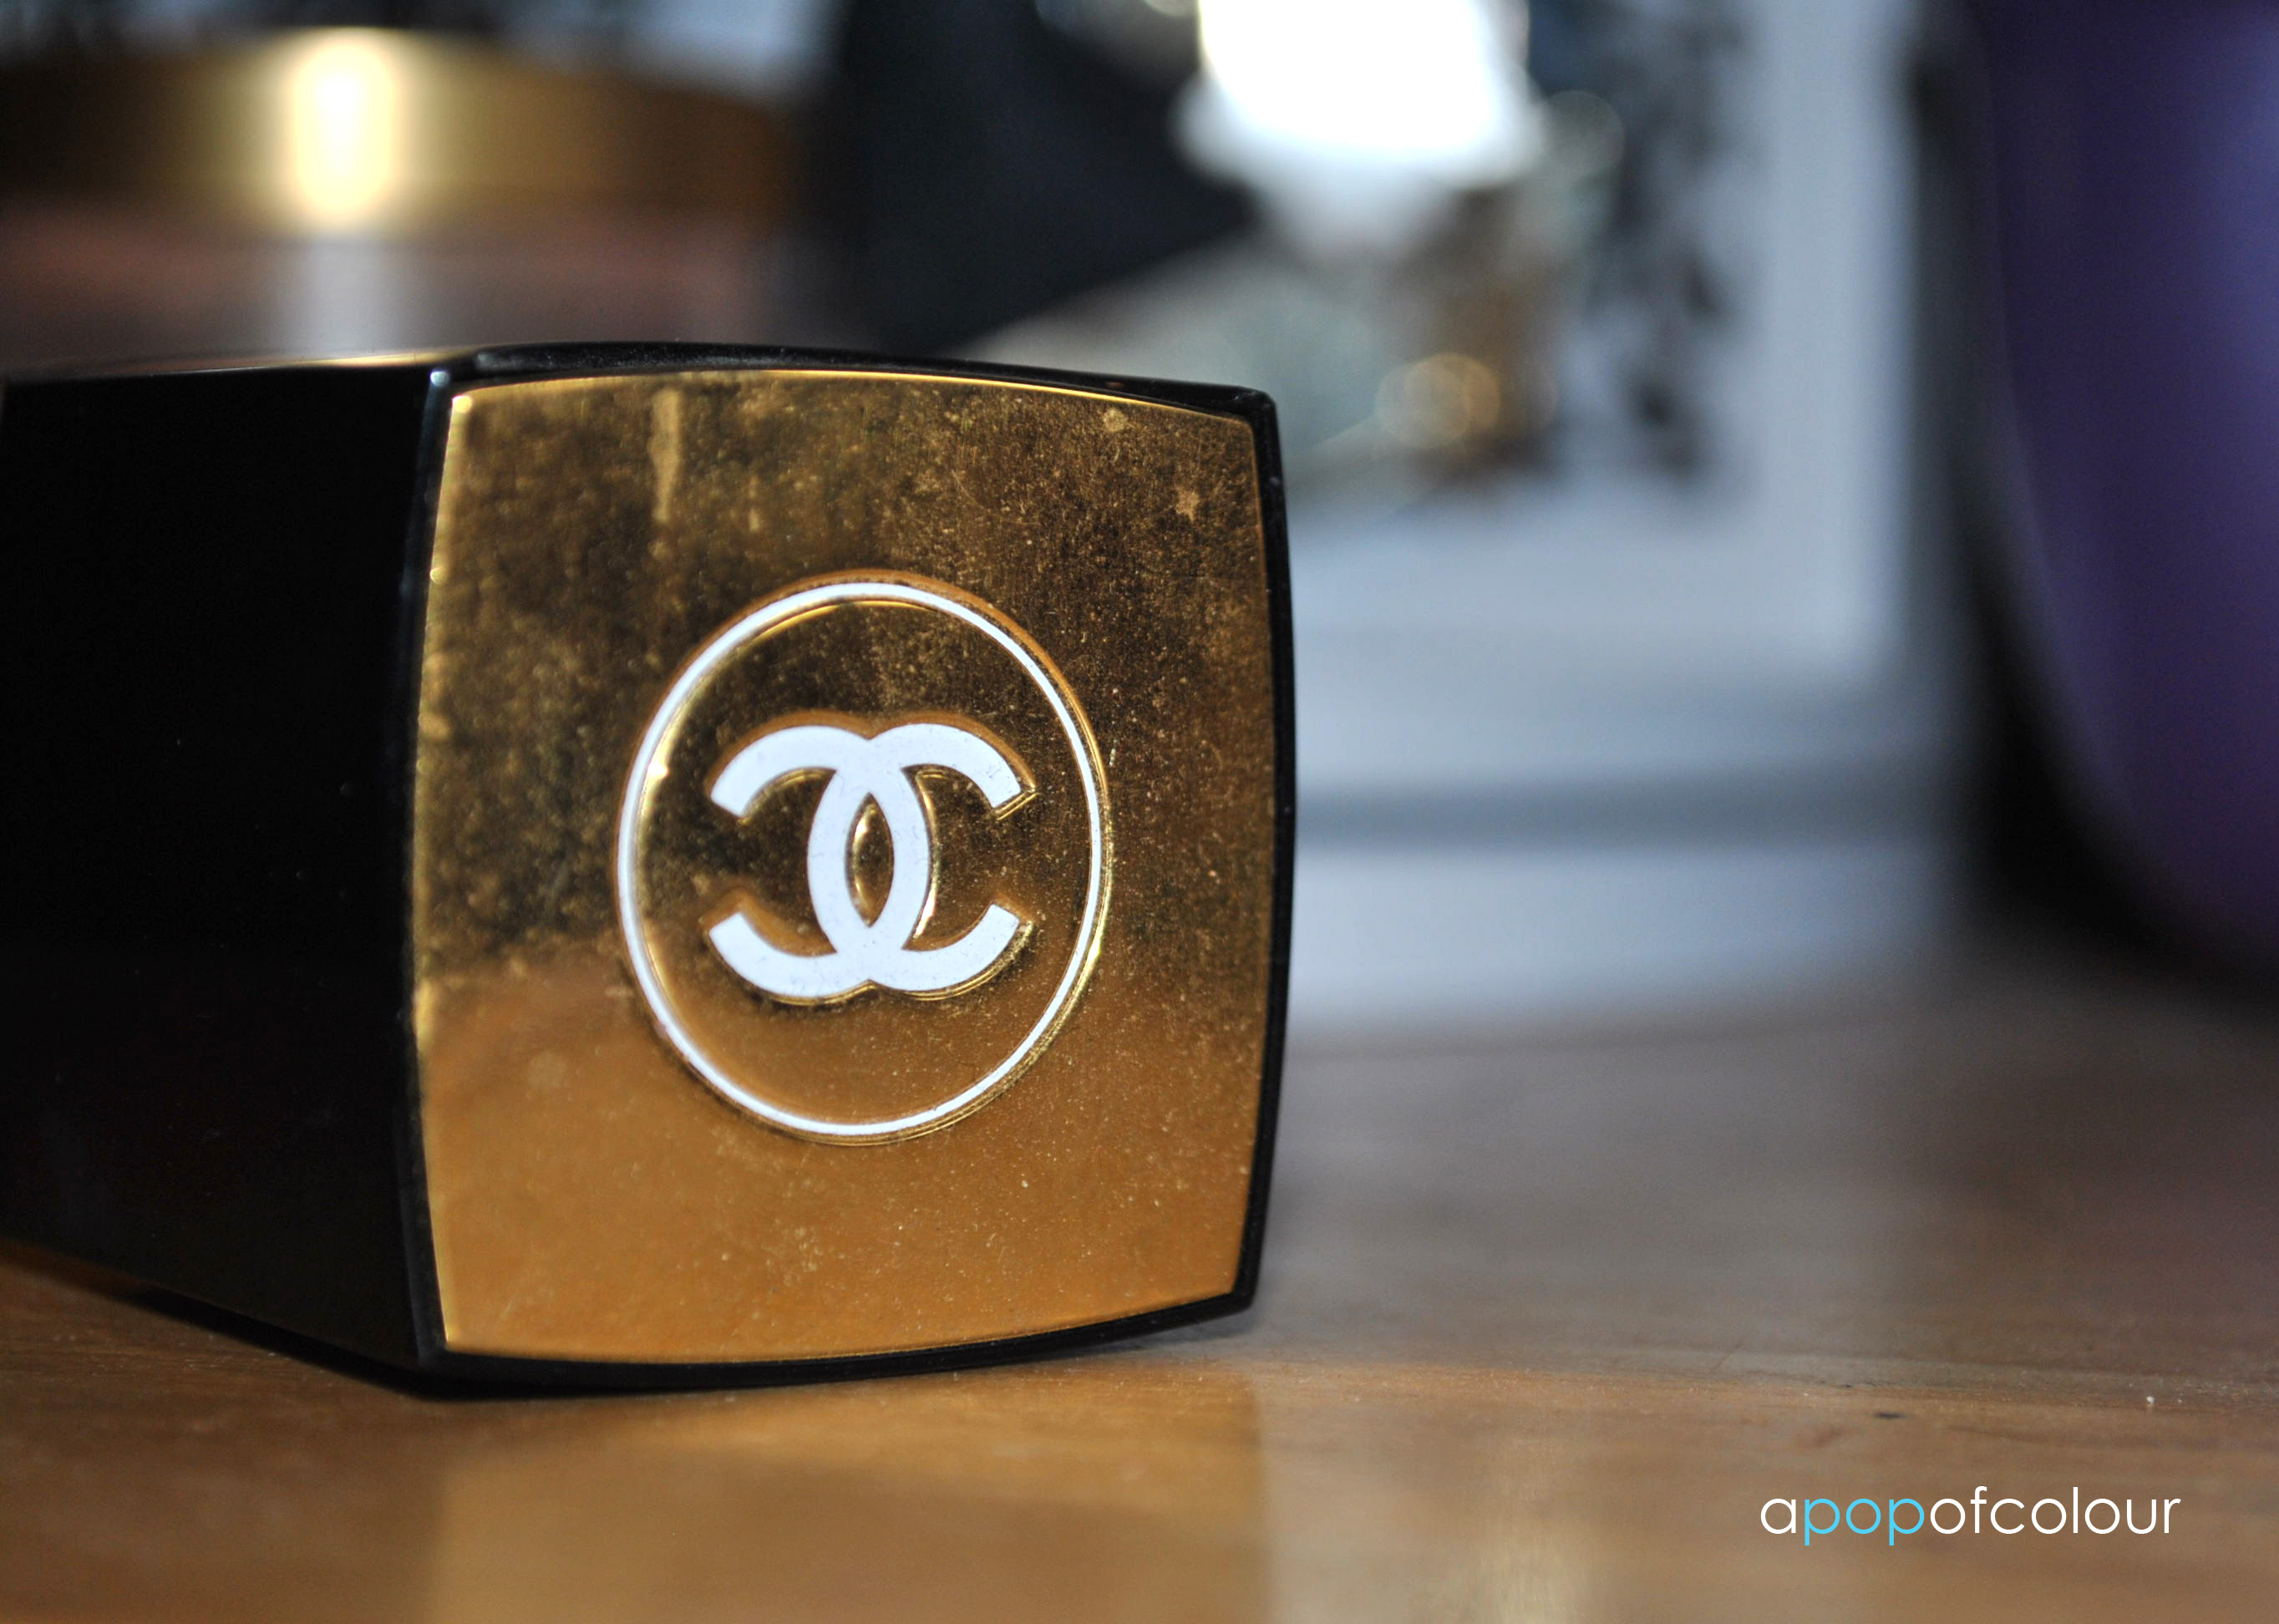 c606a28b55d9 The Cult Collection  Chanel No. 5 - A Pop of Colour